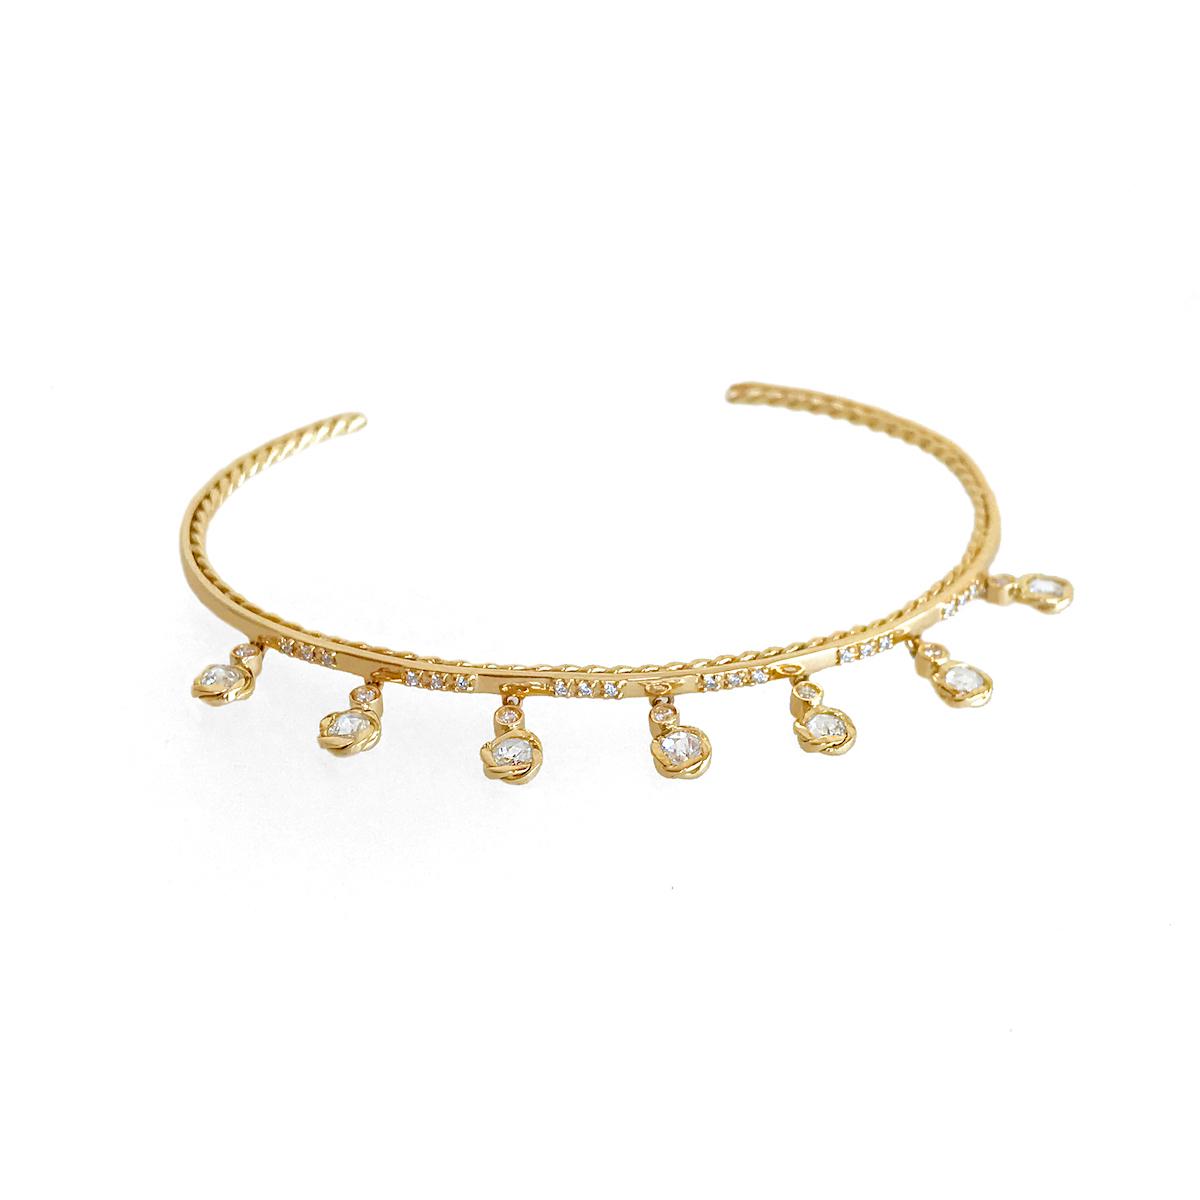 98-twist-lined-rose-cut-diamond-6-station-dangle-tassel-stackable-open-gold-cuff_4528